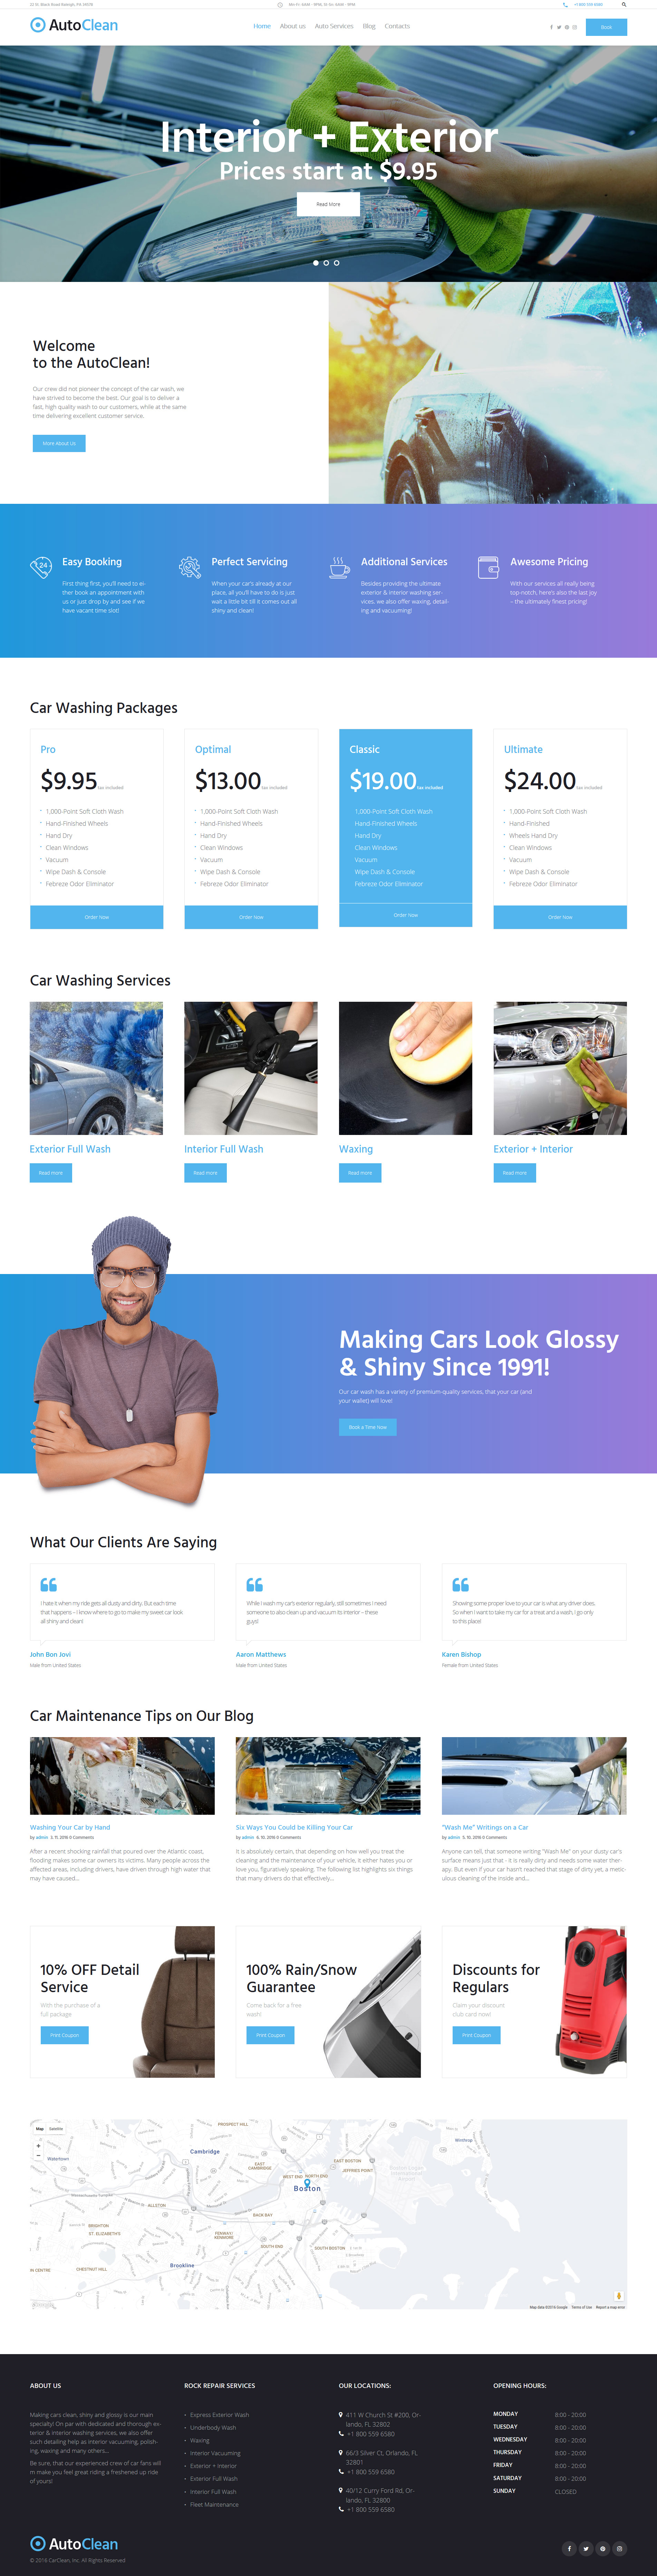 Responsivt AutoClean - Car Wash & Car Repair WordPress-tema #61224 - skärmbild